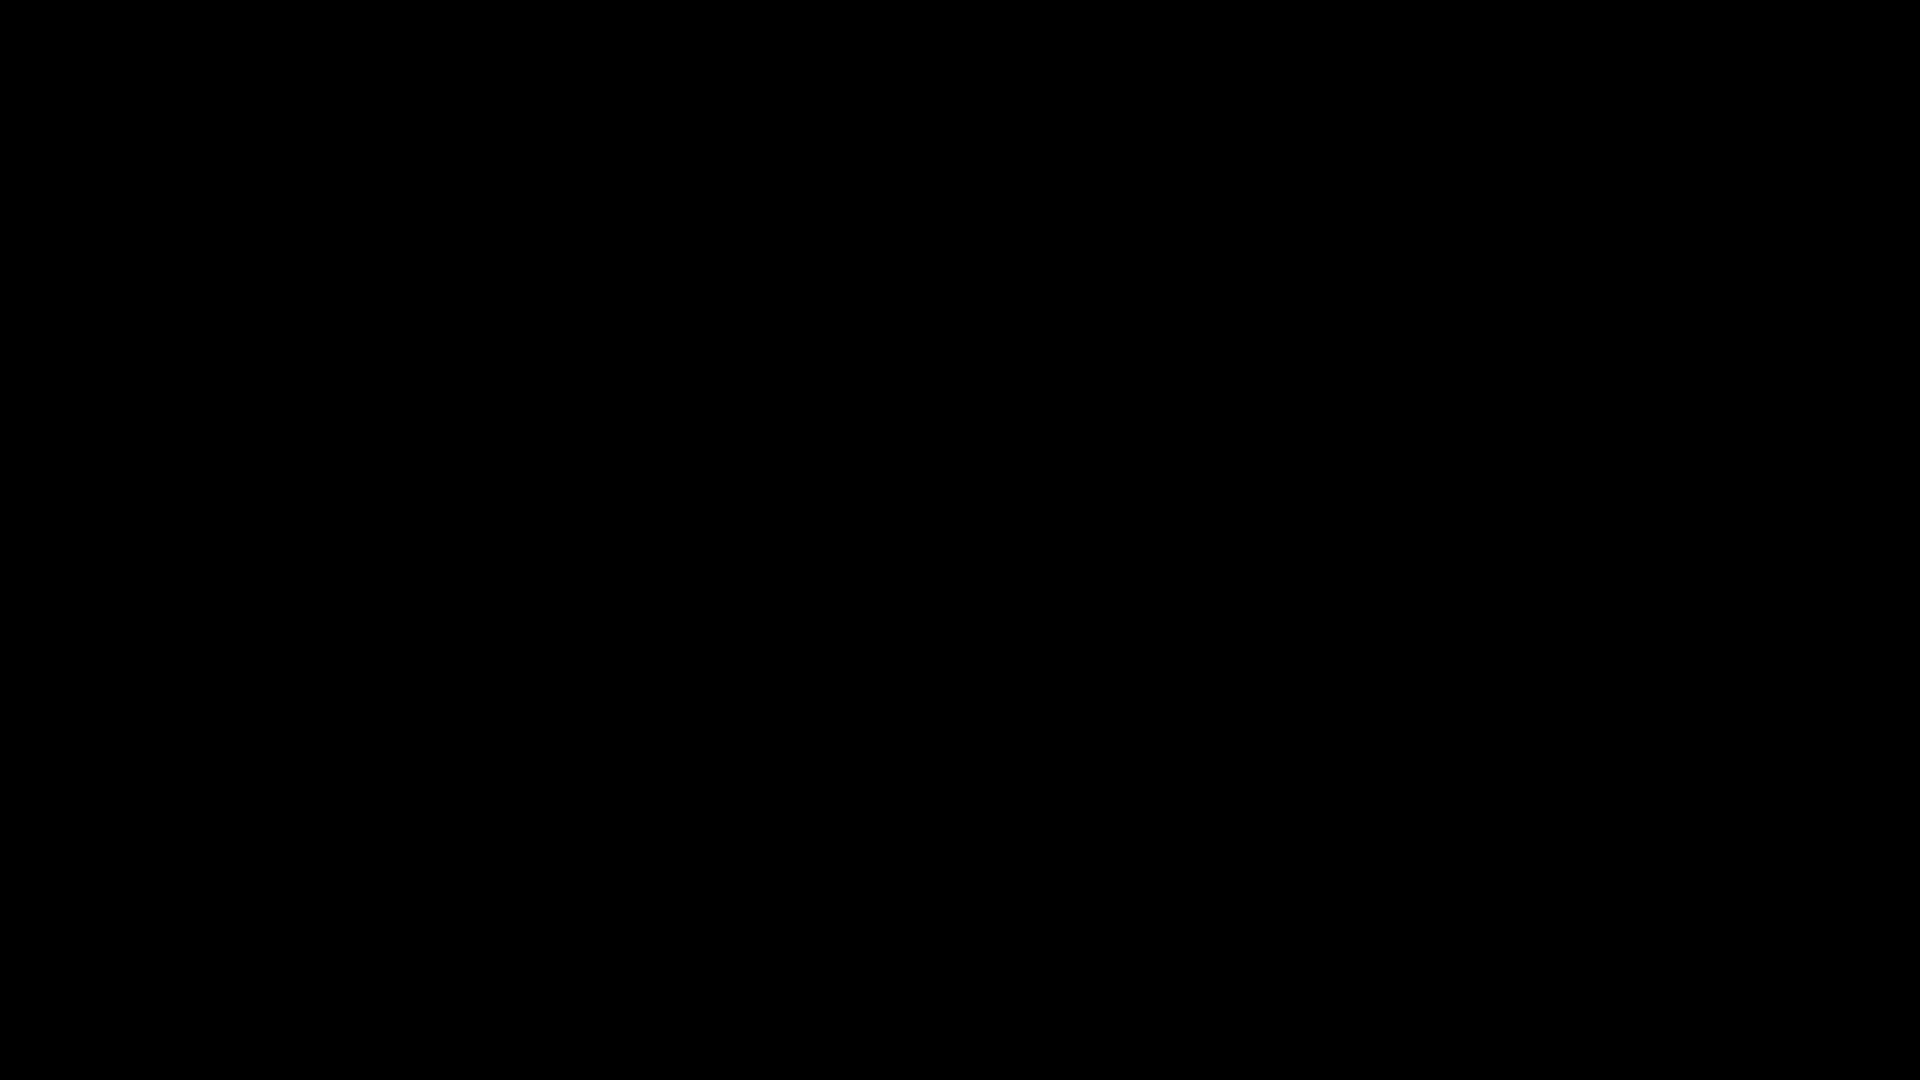 Destiny, Episode, Sandbox, Shenanigan, Shenanigans, aegis, arcstaff, arcstrider, buster, experiment, experiments, five, hunter, mind, myth, mythbuster, mythbusters, super, titan, warlock, Destiny 2 | Sandbox Shenanigans [Episode 5] GIFs